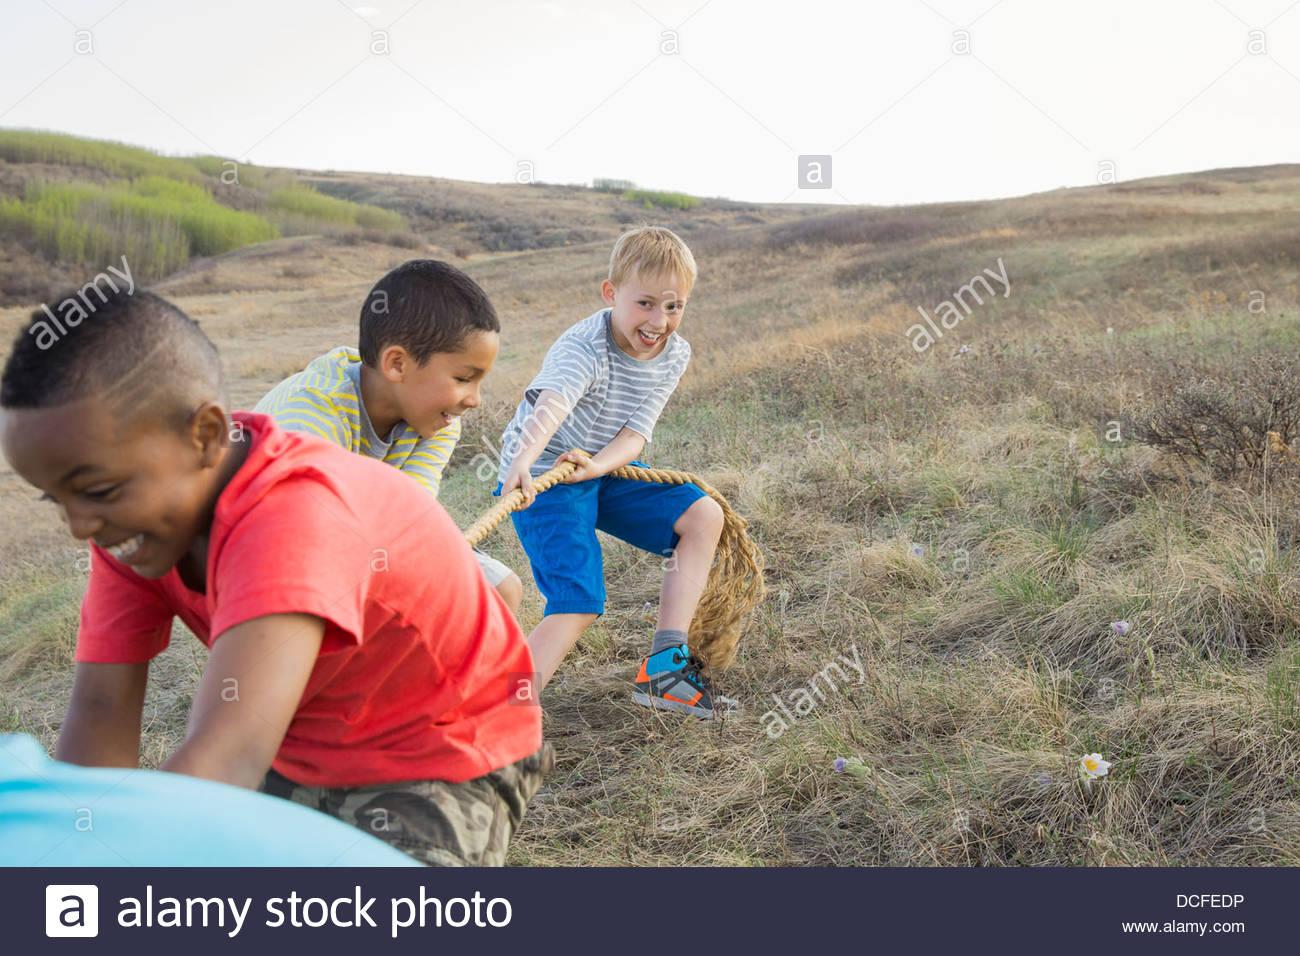 Schoolboys playing tug-of-war - Stock Image